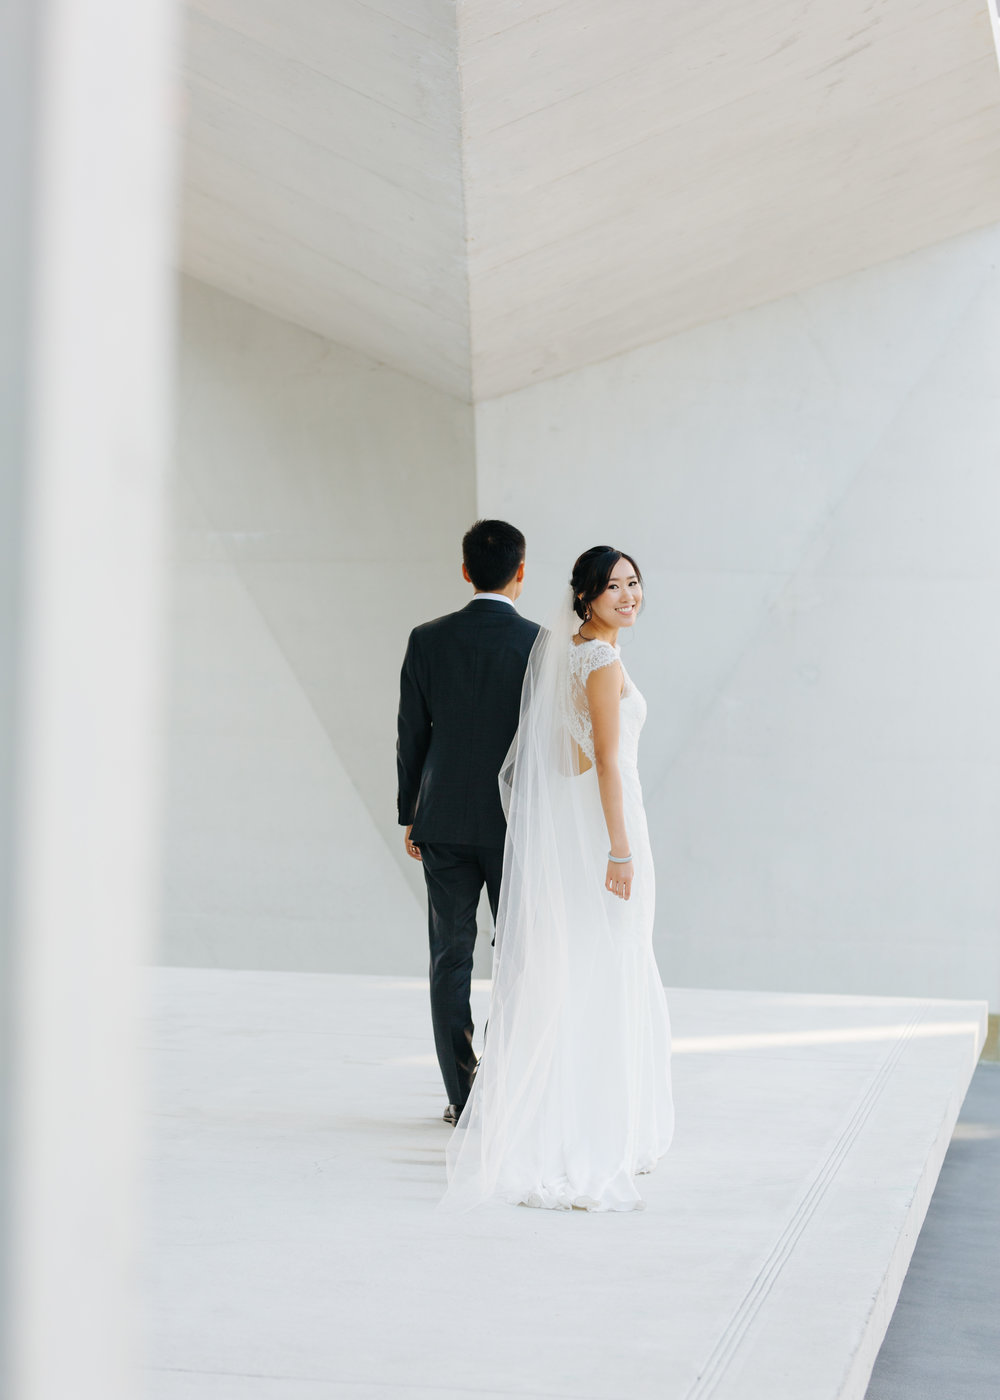 herastudios_wedding_julie_jason_hera_selects-77.jpg